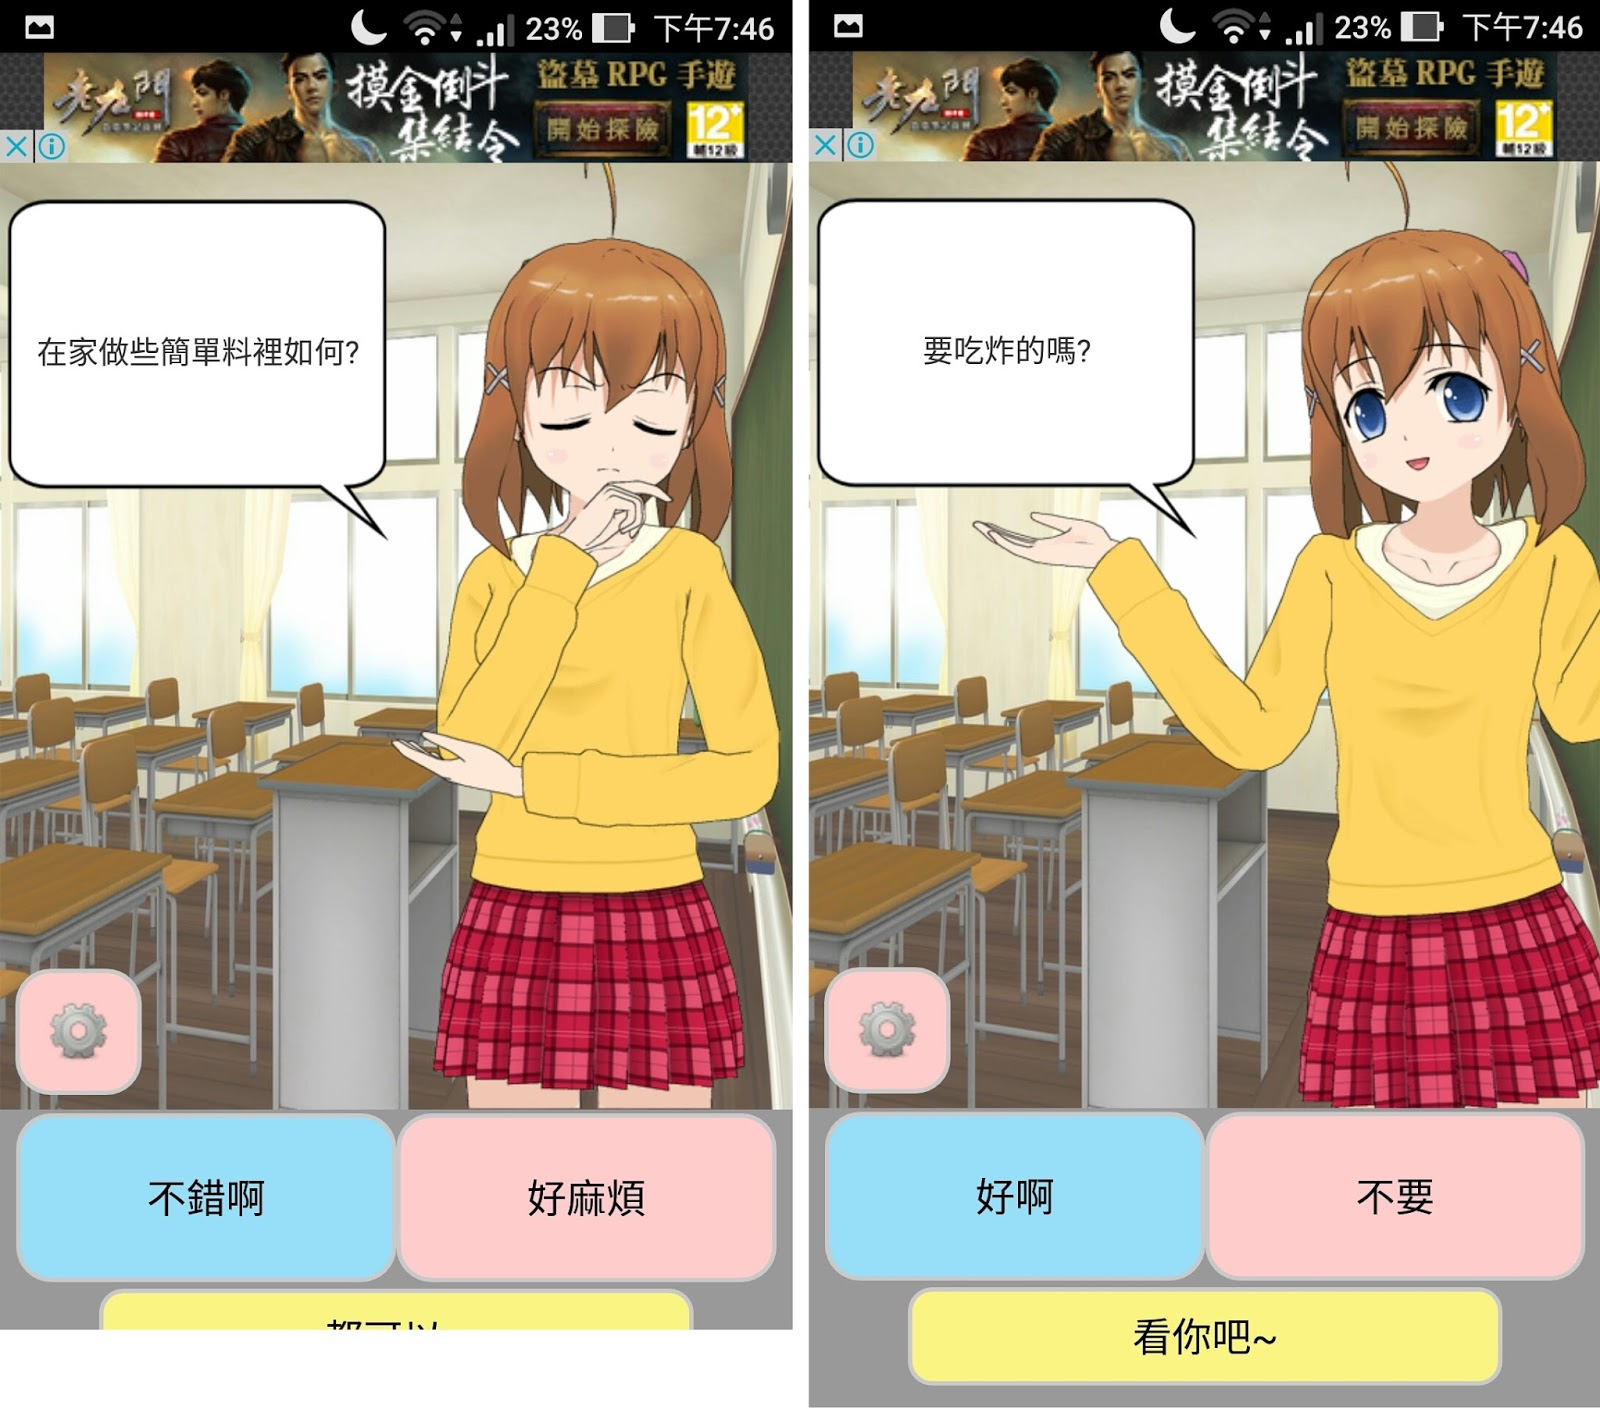 Screenshot 20170422 194655 - 「等下吃什麼?」總是猶豫不決,就讓虛擬女友幫你決定!